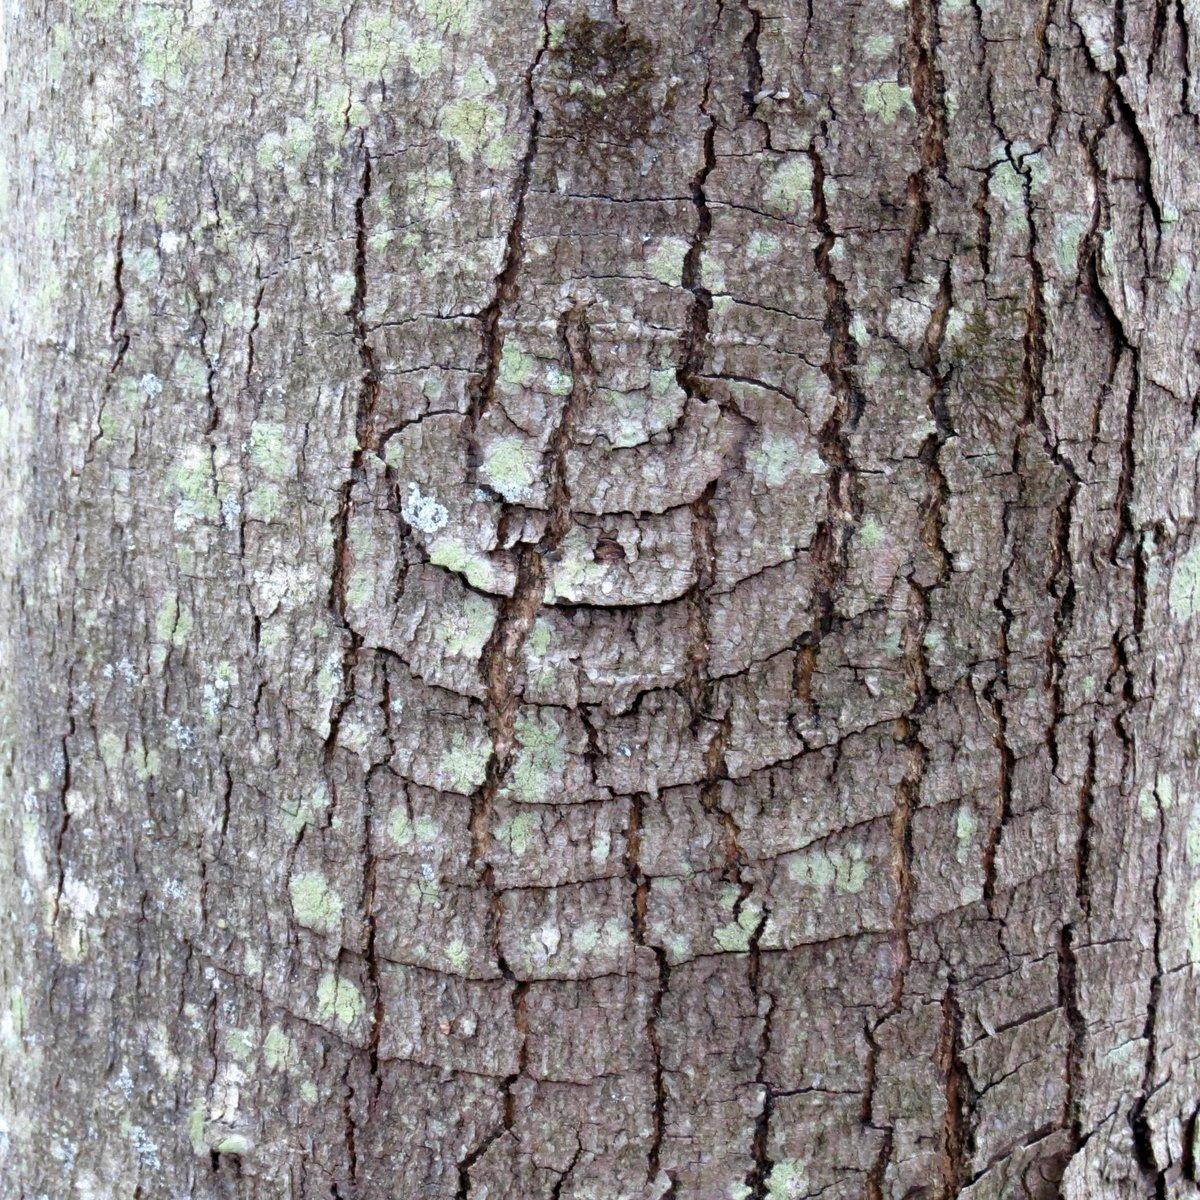 10. Pattern in Red Maple Tree Bark